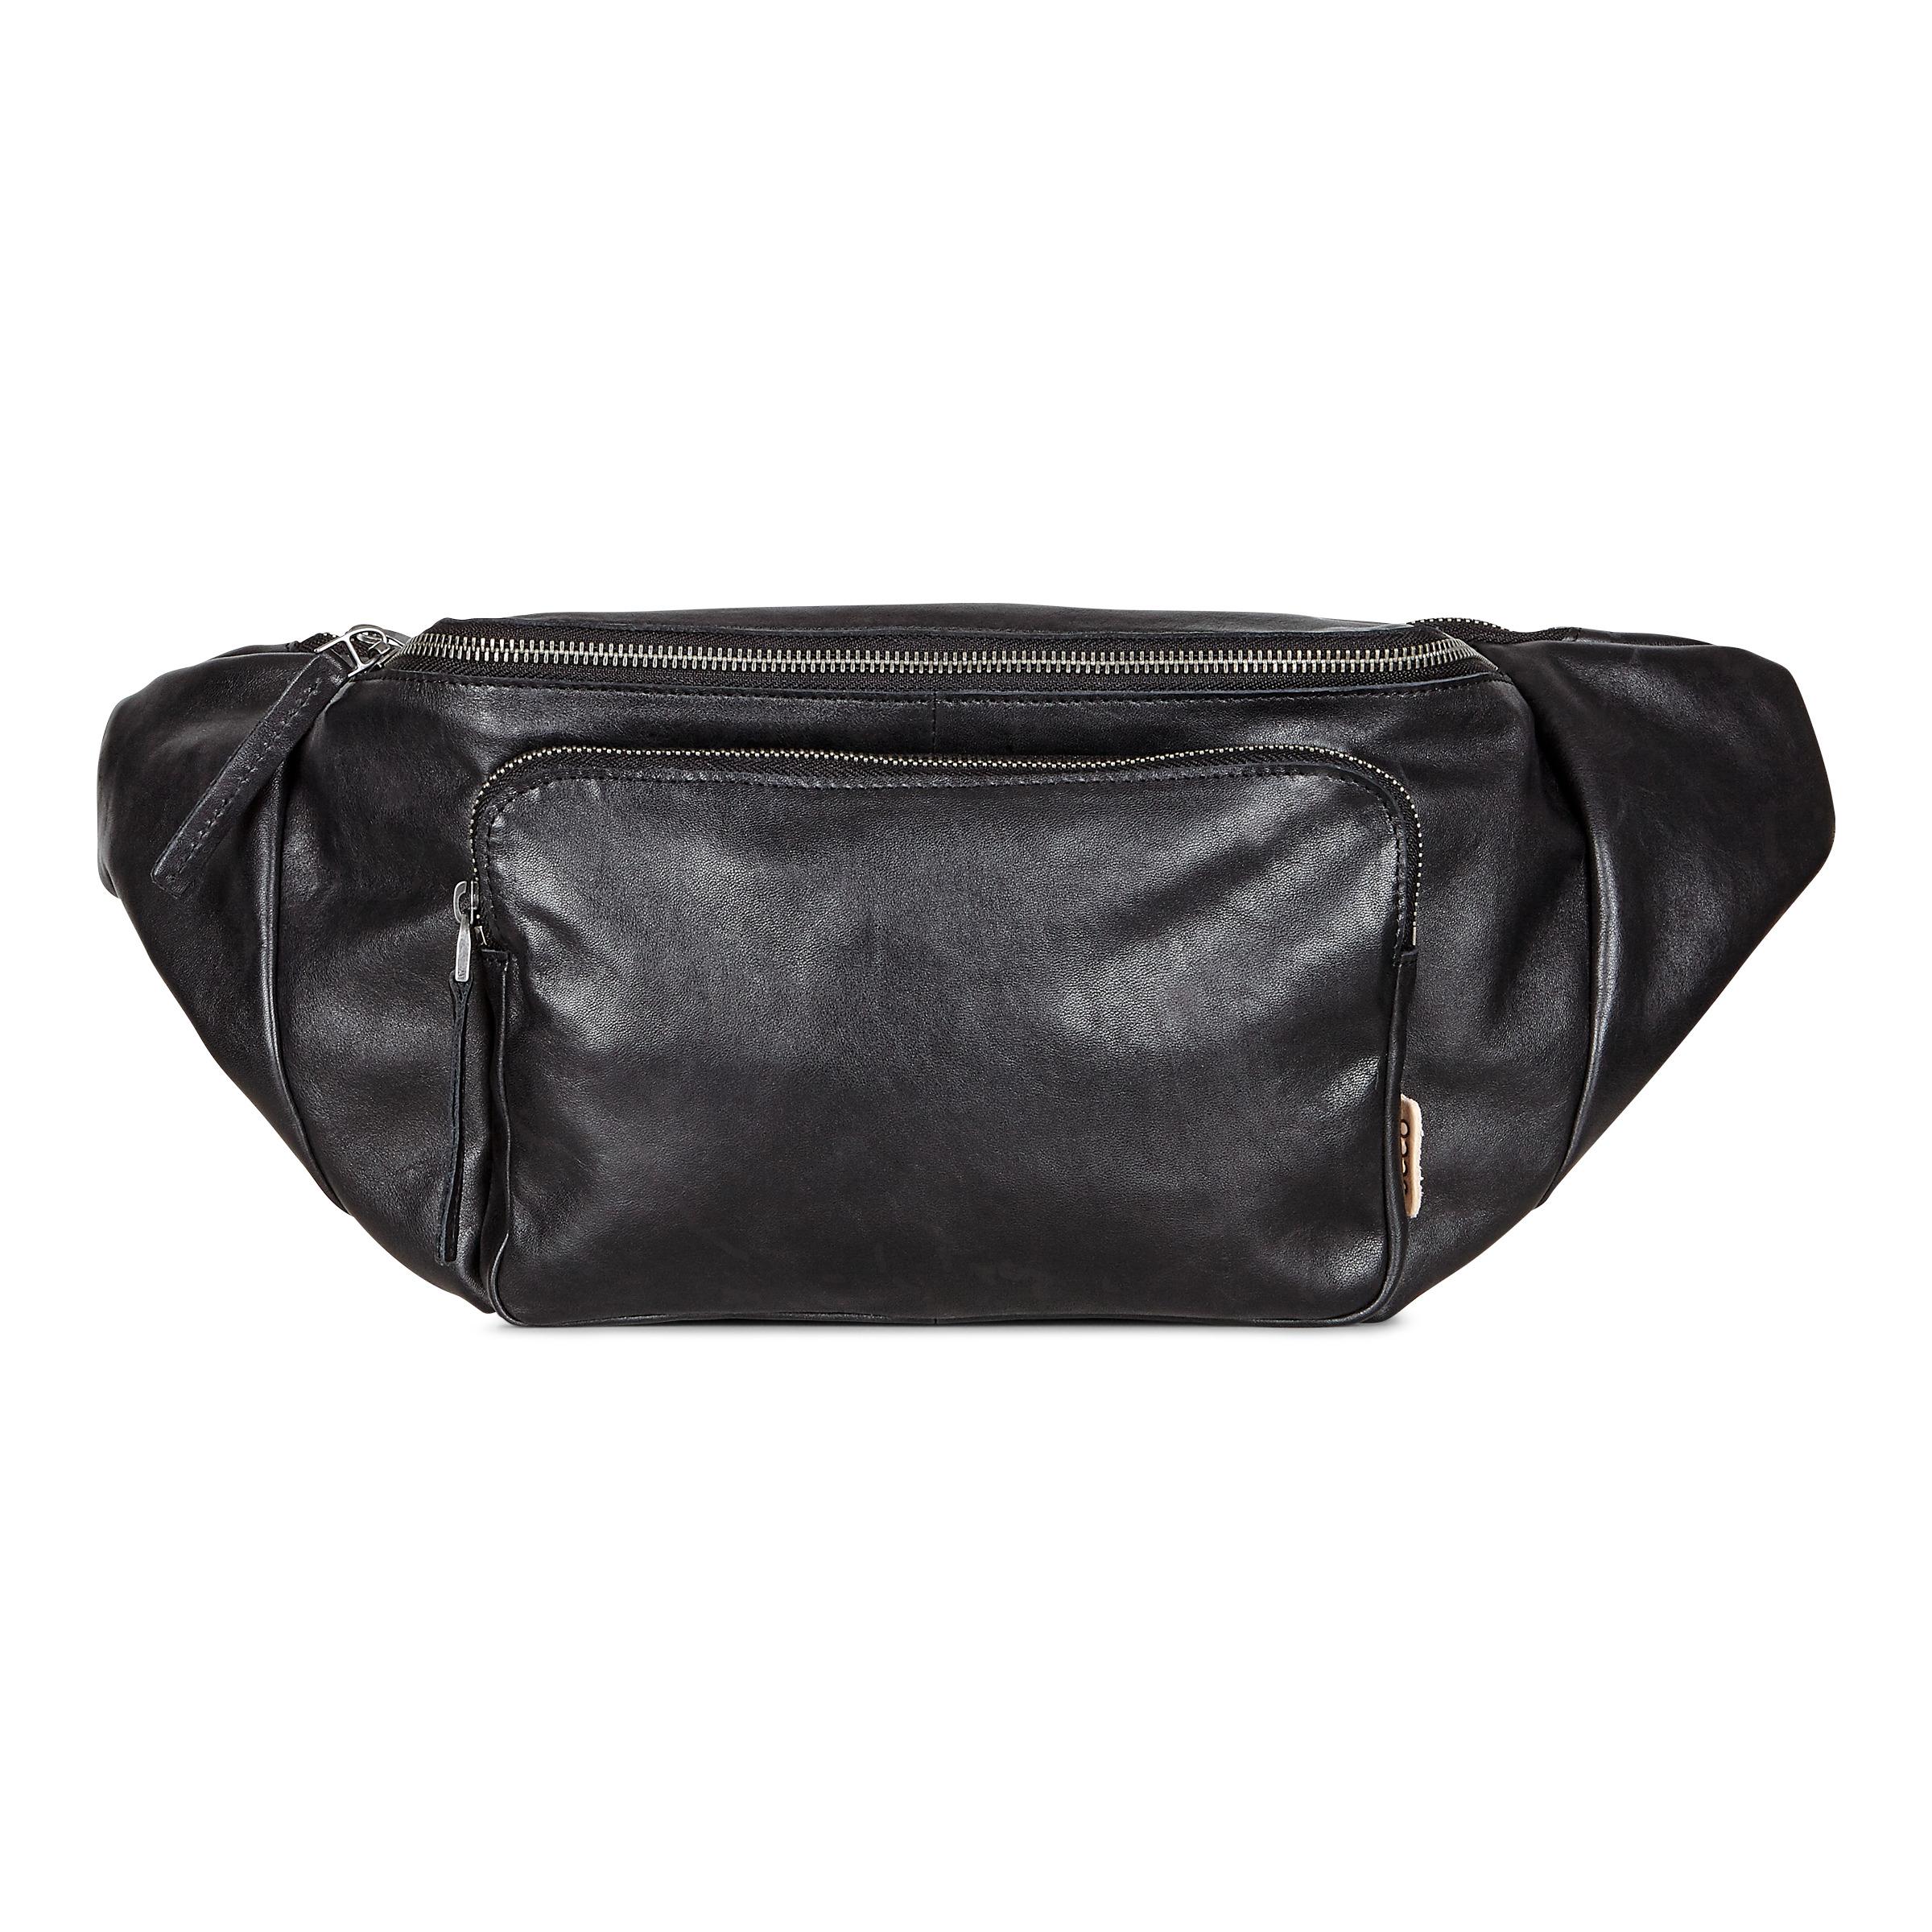 Image of ECCO Casper Sling Bag